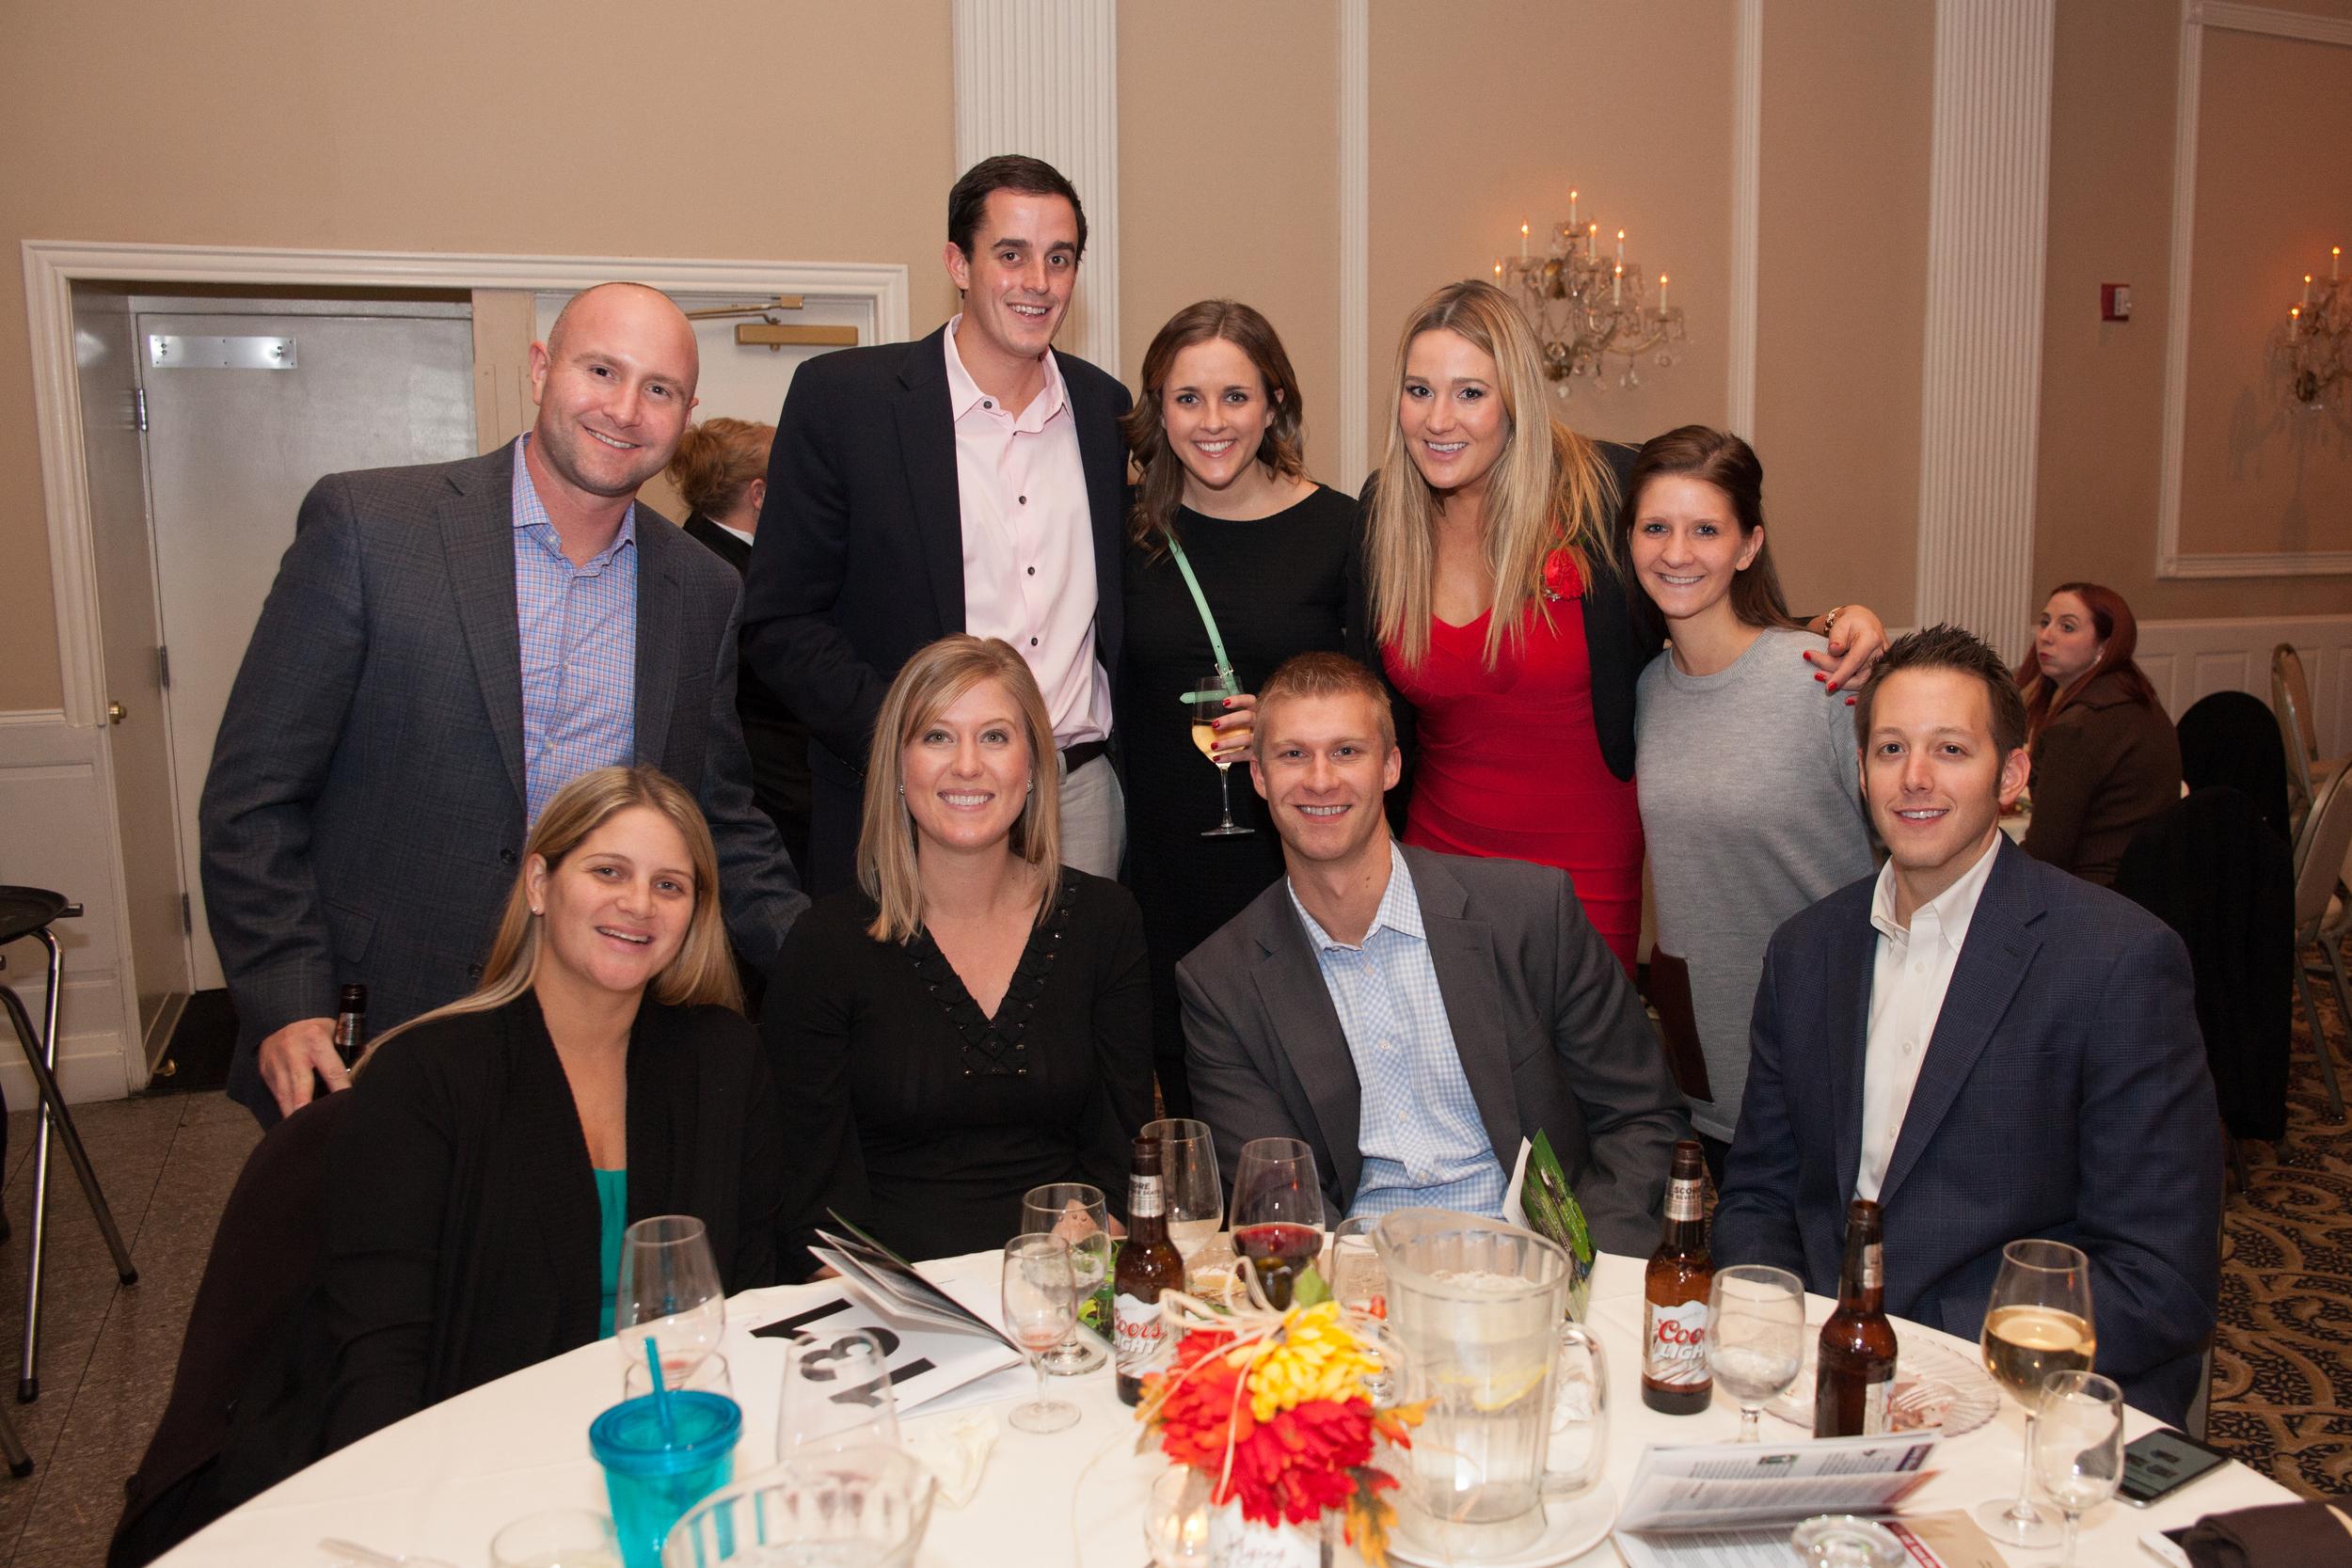 Pictured above: NAI Hiffman's Jason Wurtz, Sarah Lejman, Aubrey Van Reken, Krystyl Smalarz, Michael Quaid and Adam Johnson.